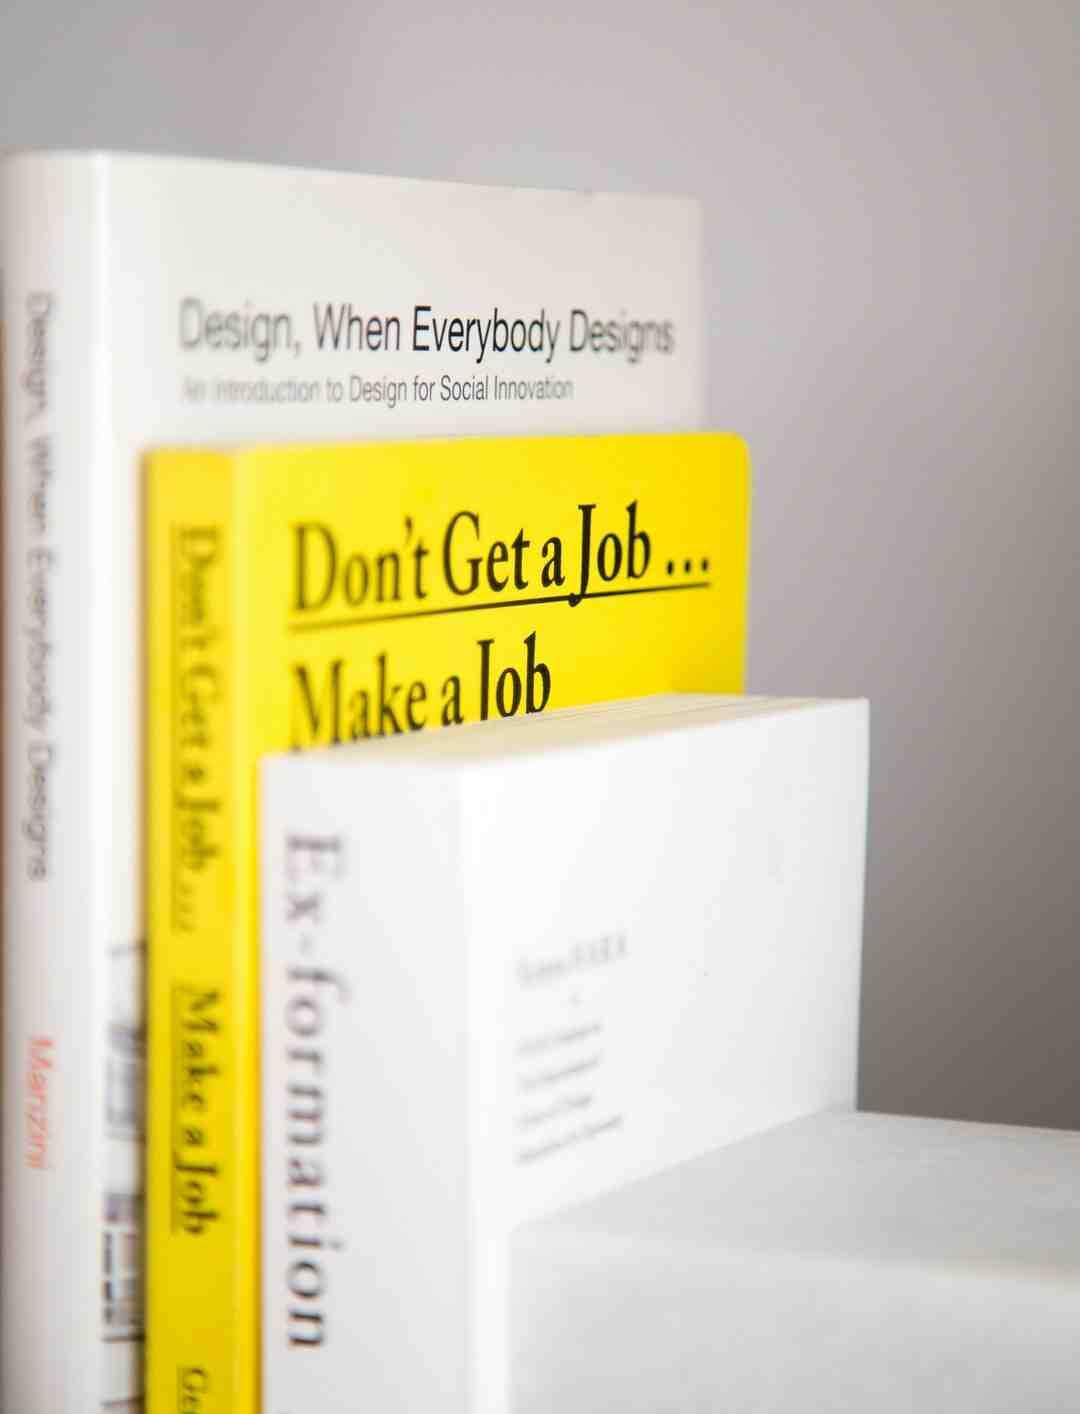 How to Rent Books on Amazon